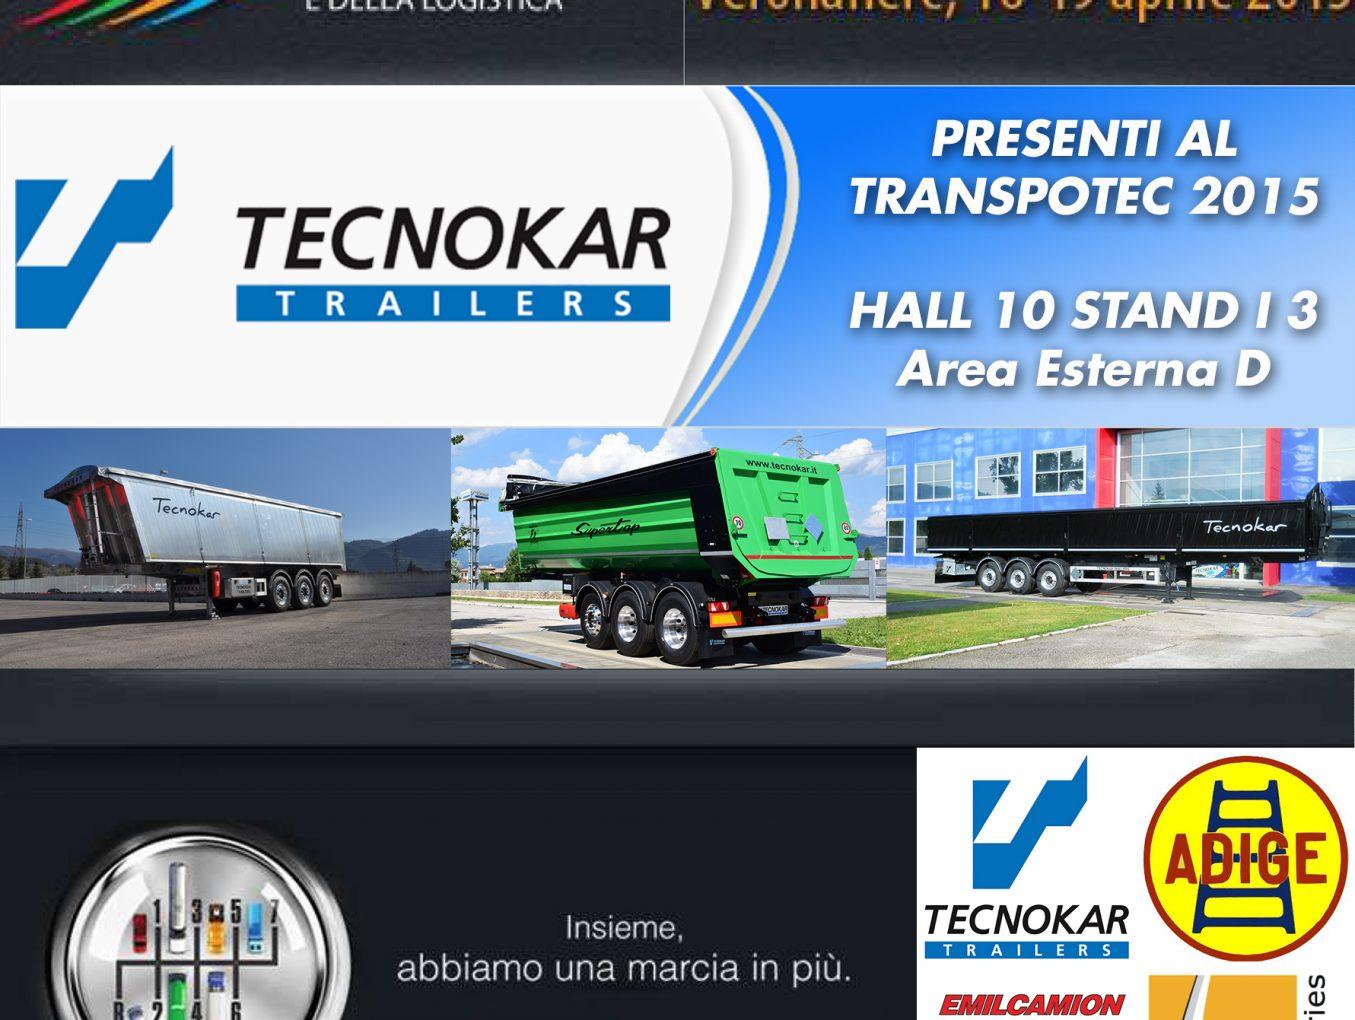 Transpotec 2015